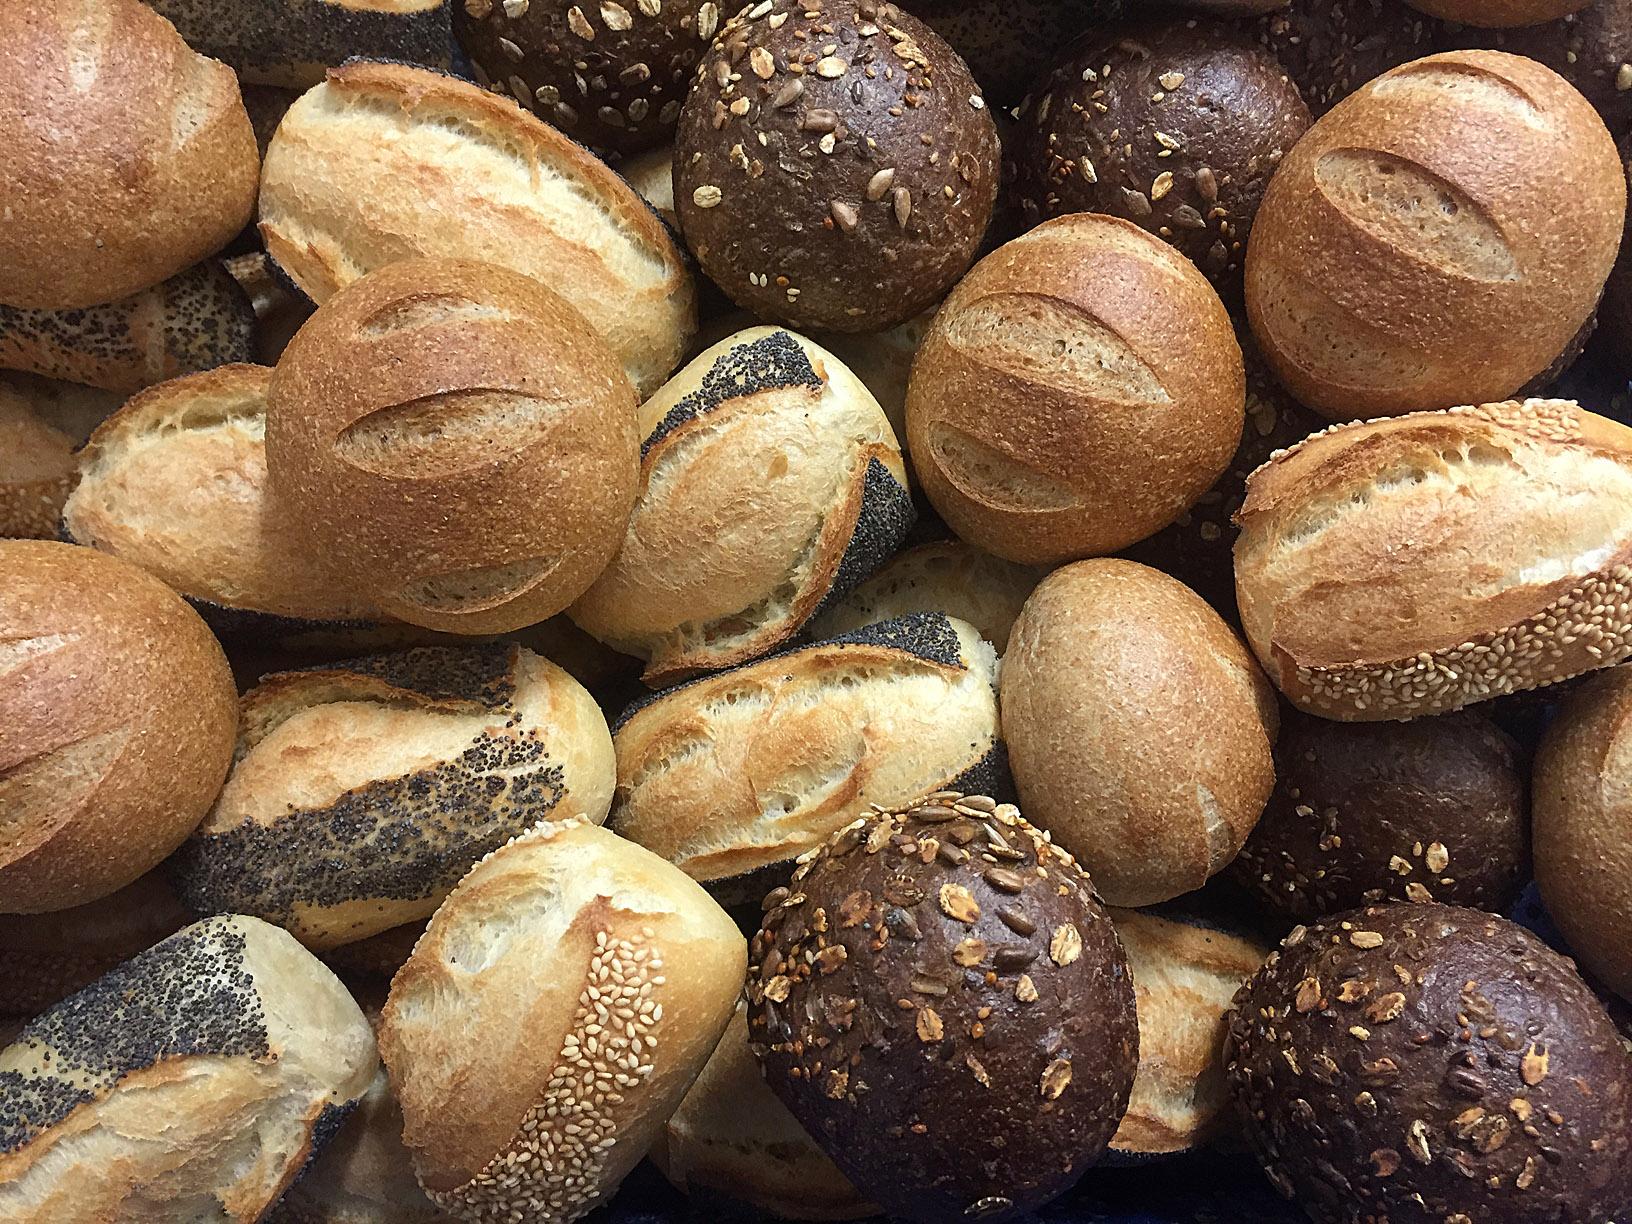 Boulangerie grand villeurbanne